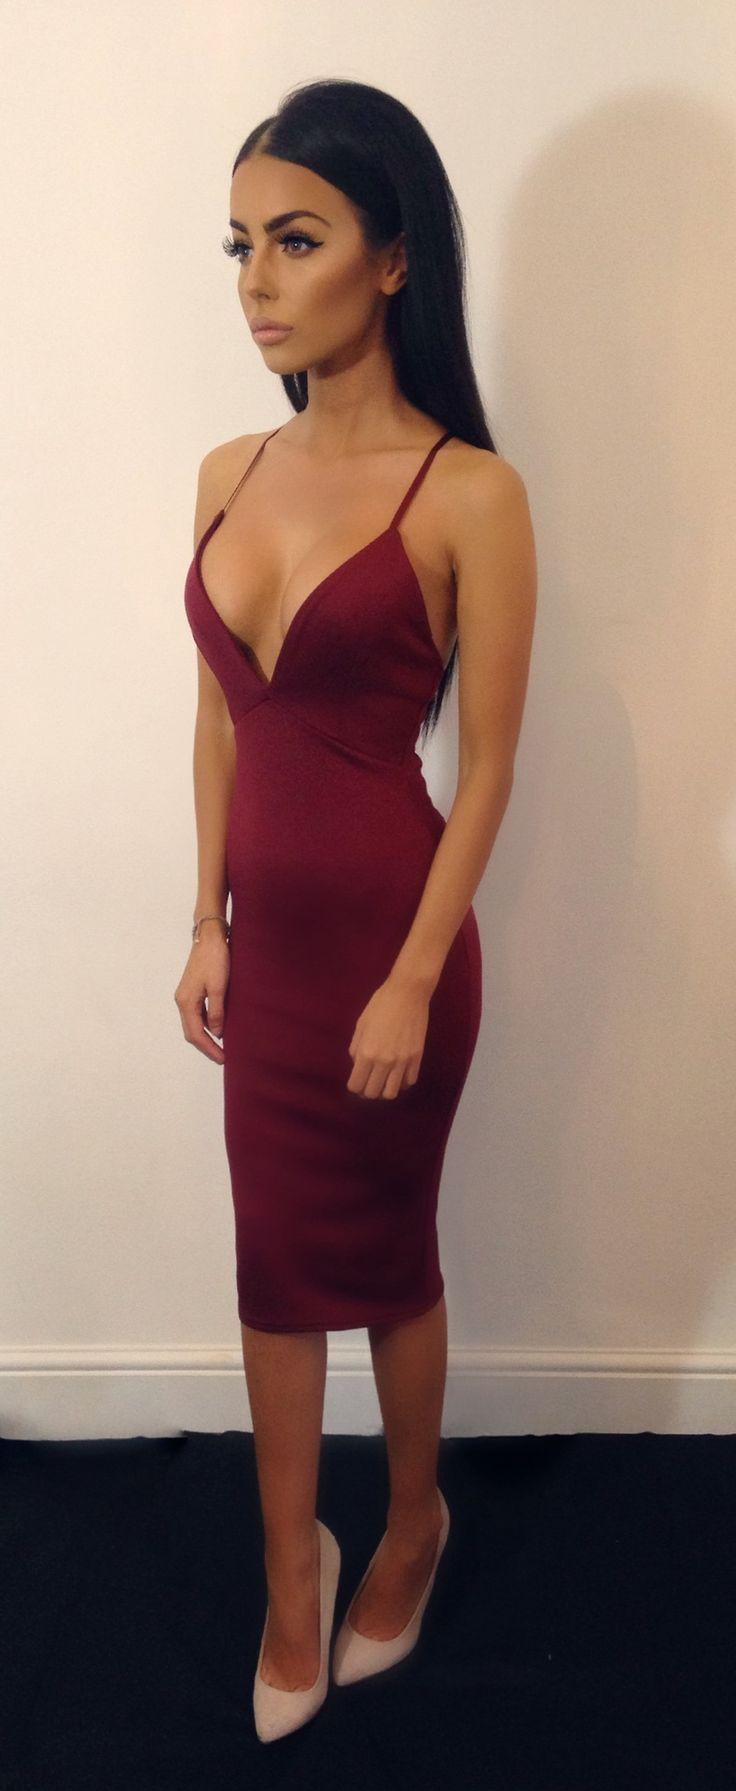 Cute dress....but I'm pretty sure that's a mannequin lol